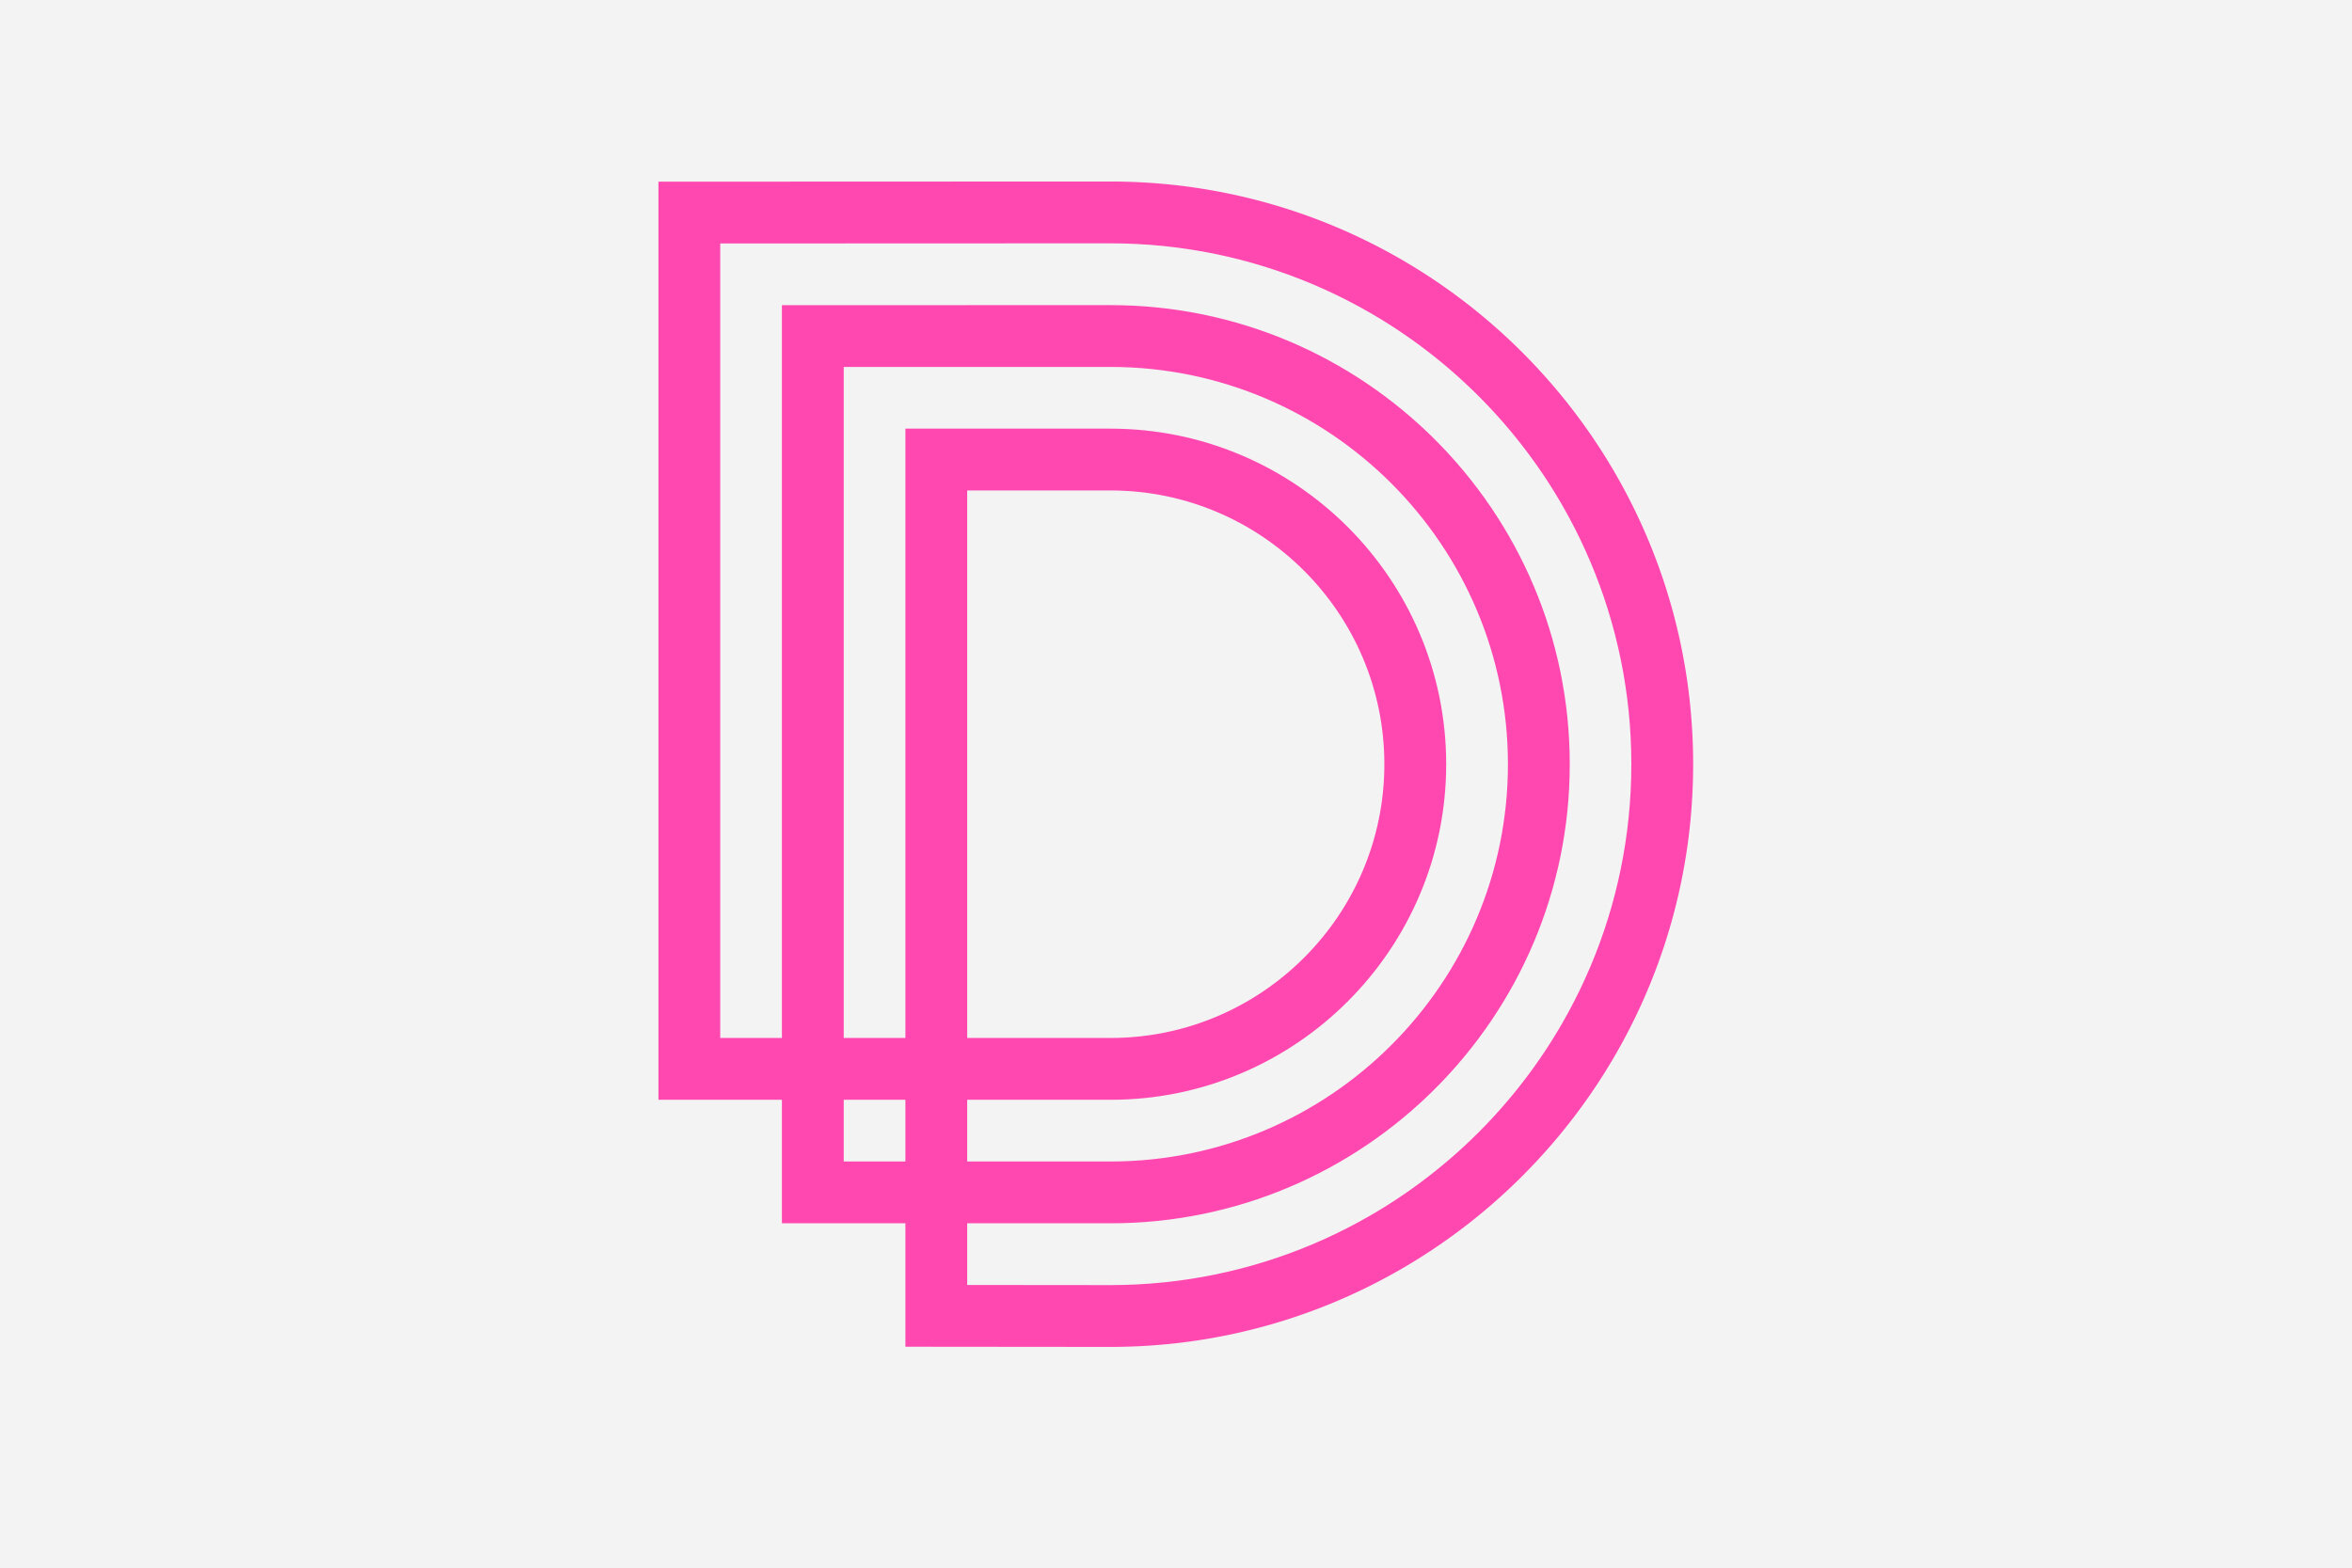 Logo_Dazzle2_Shortlife.jpg